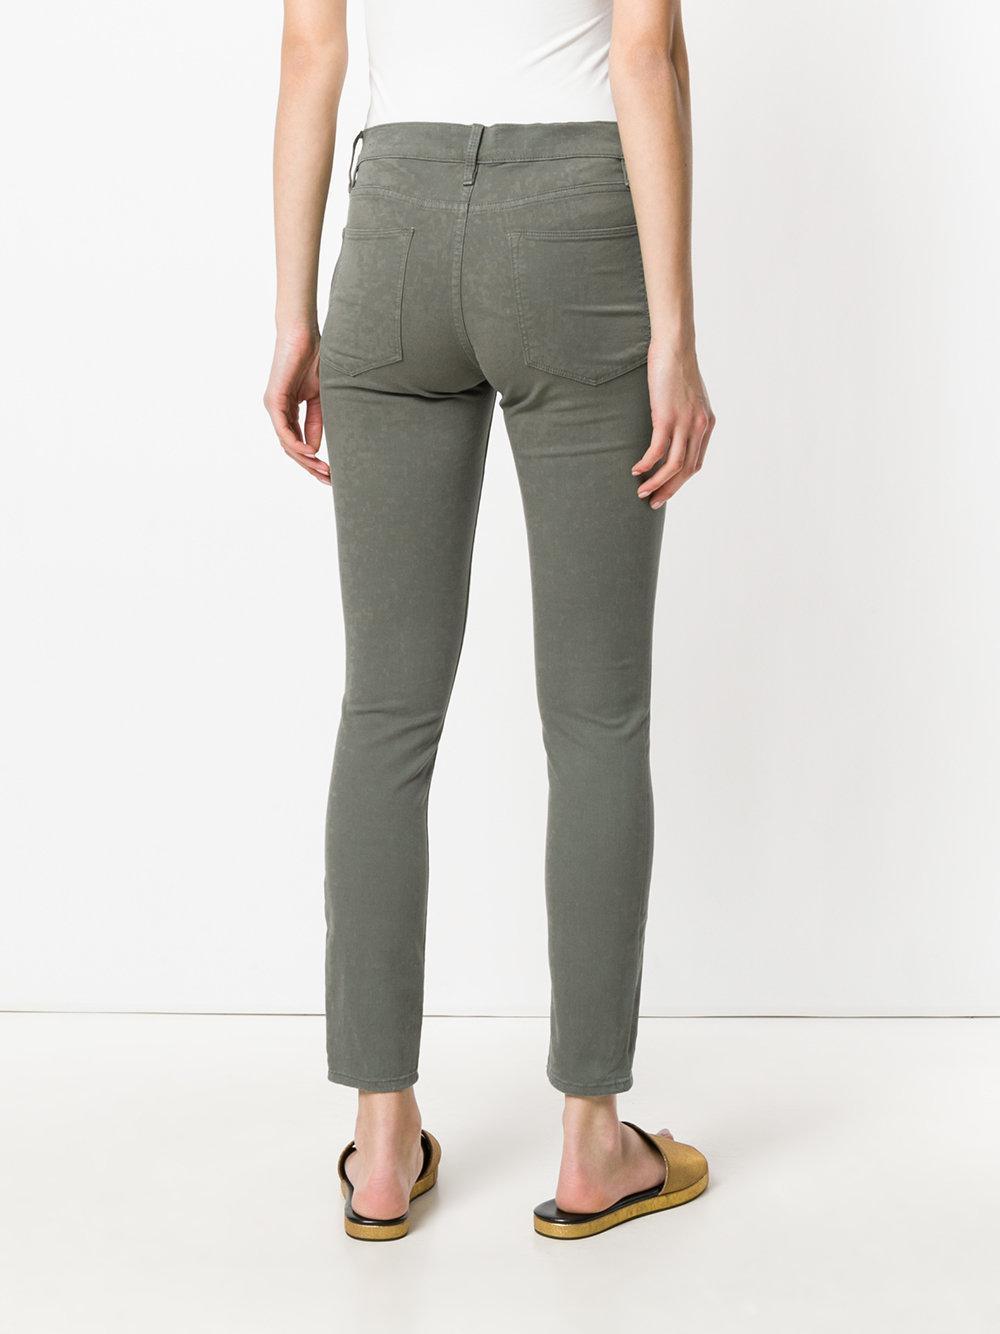 FRAME Denim Le High Skinny Jeans in Green